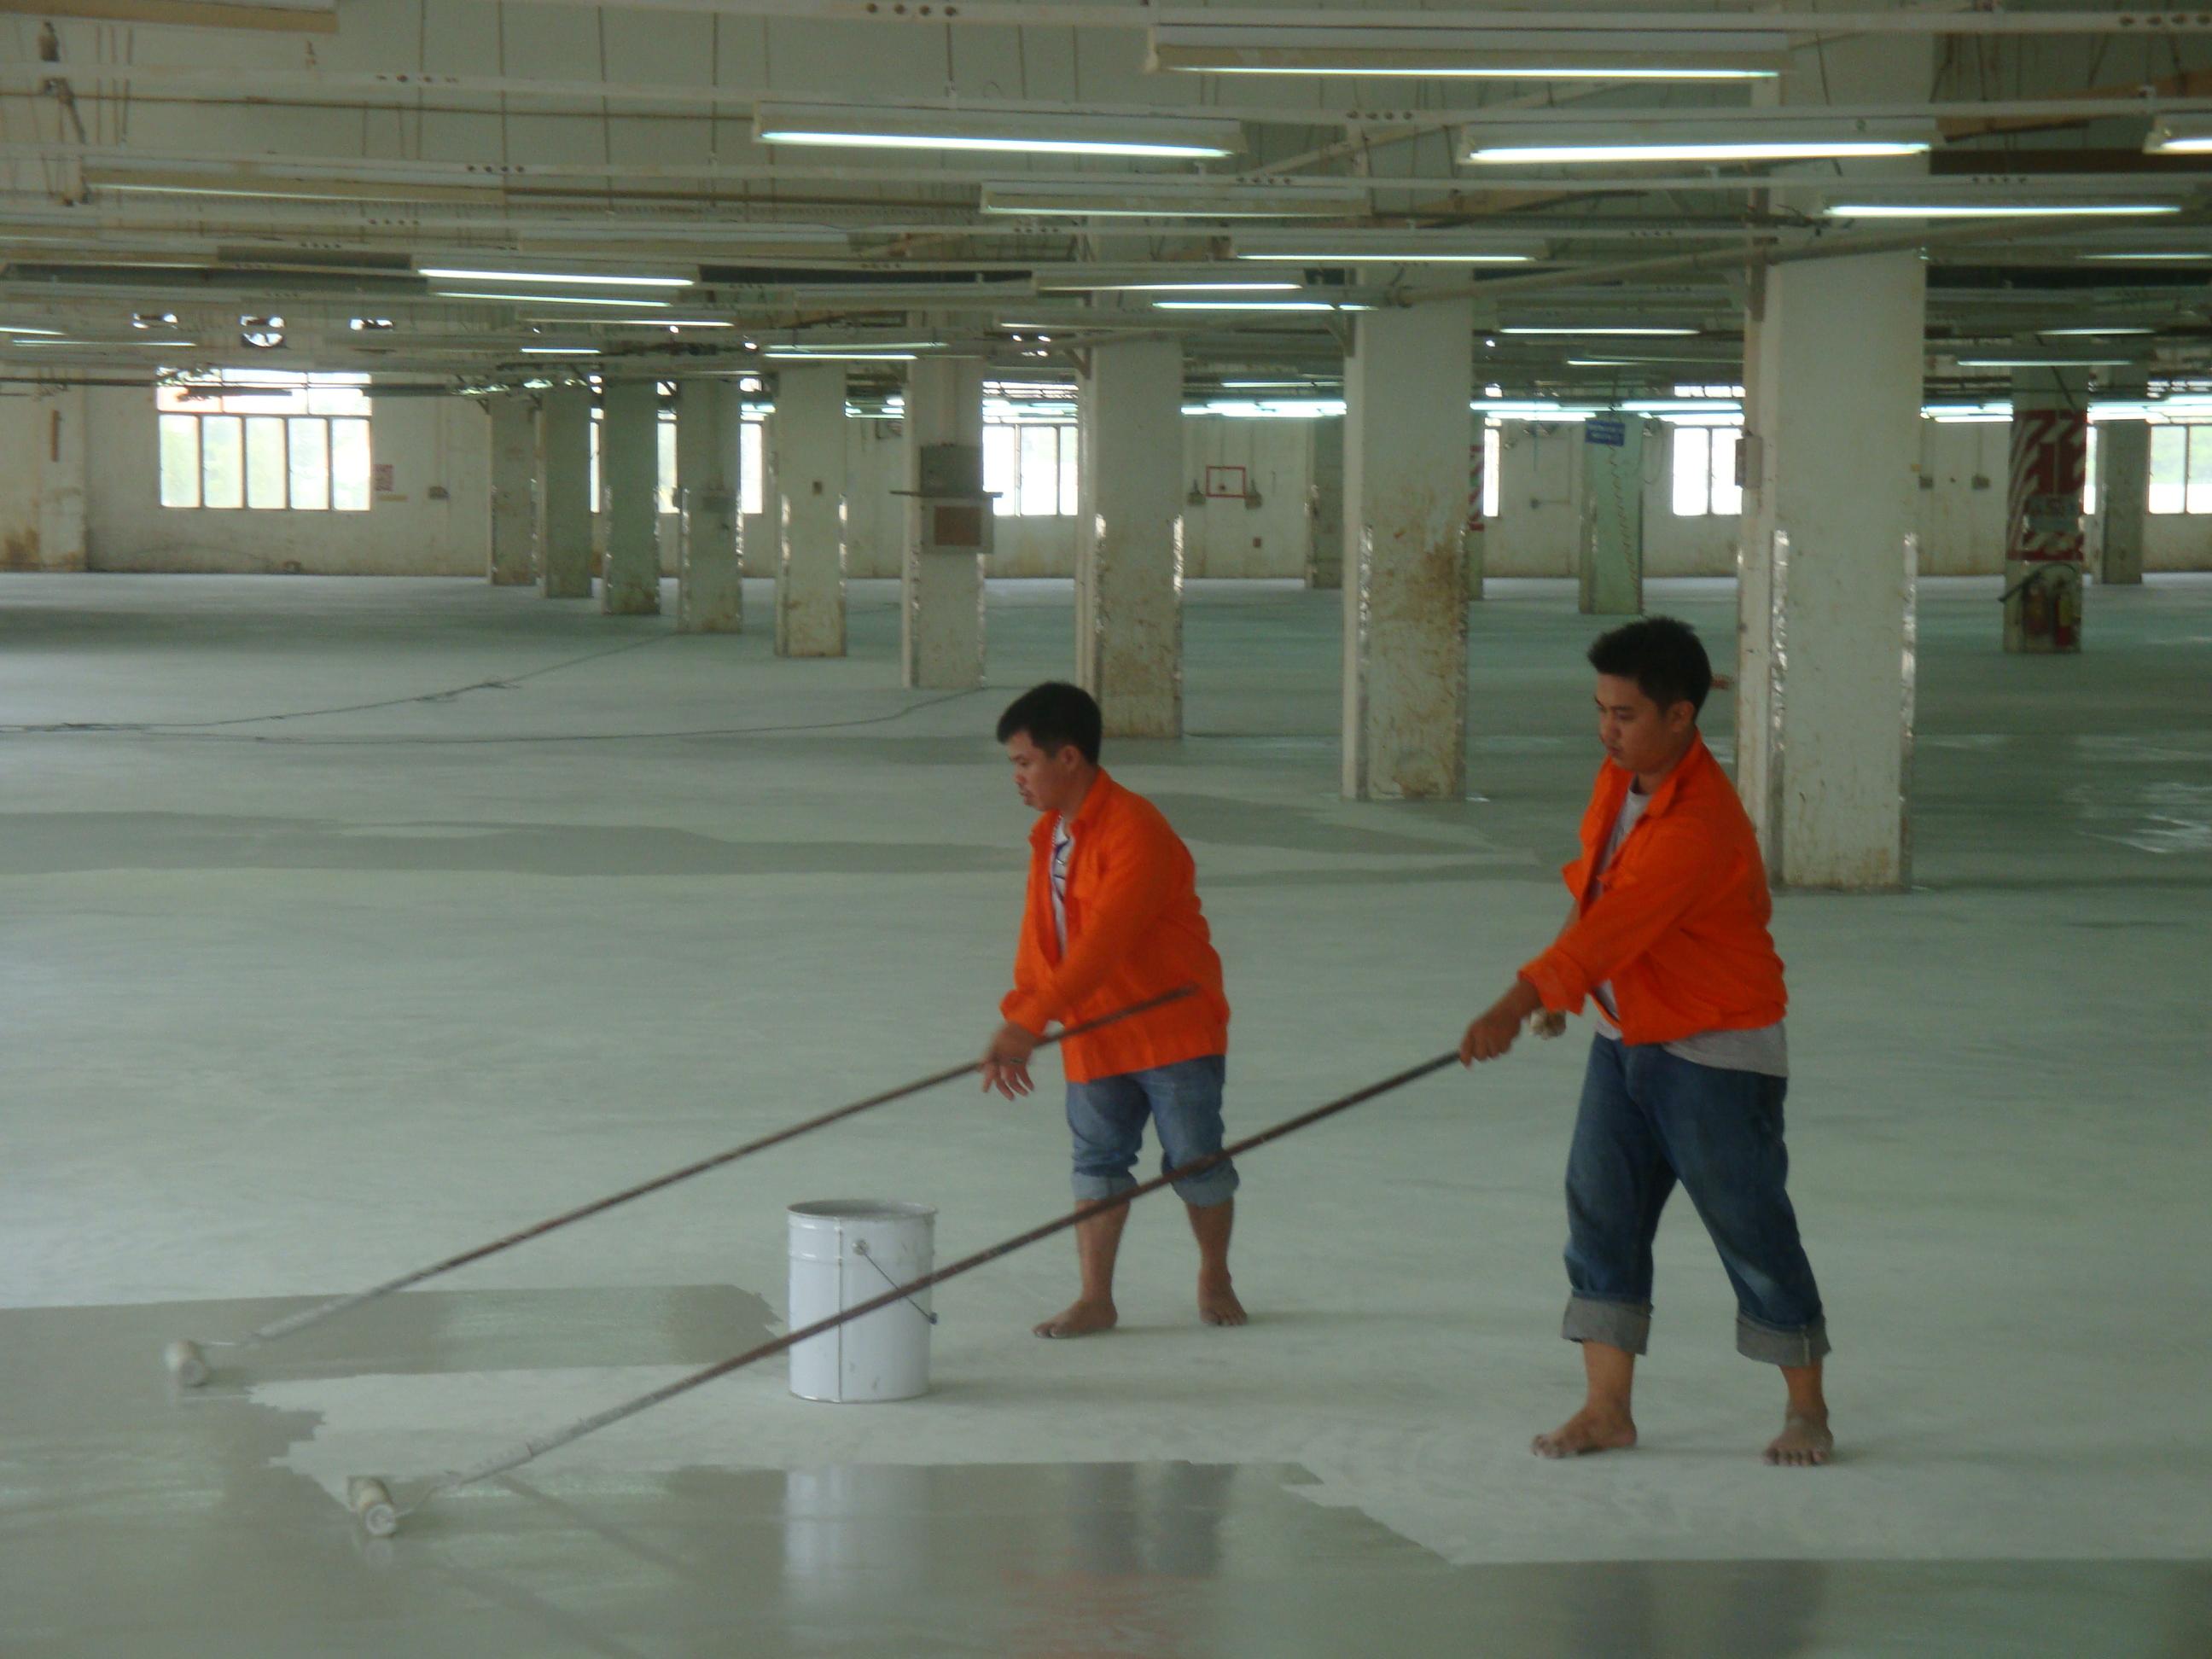 thi-cong-lan-san-nuoc-cho-san-be-tong-uot